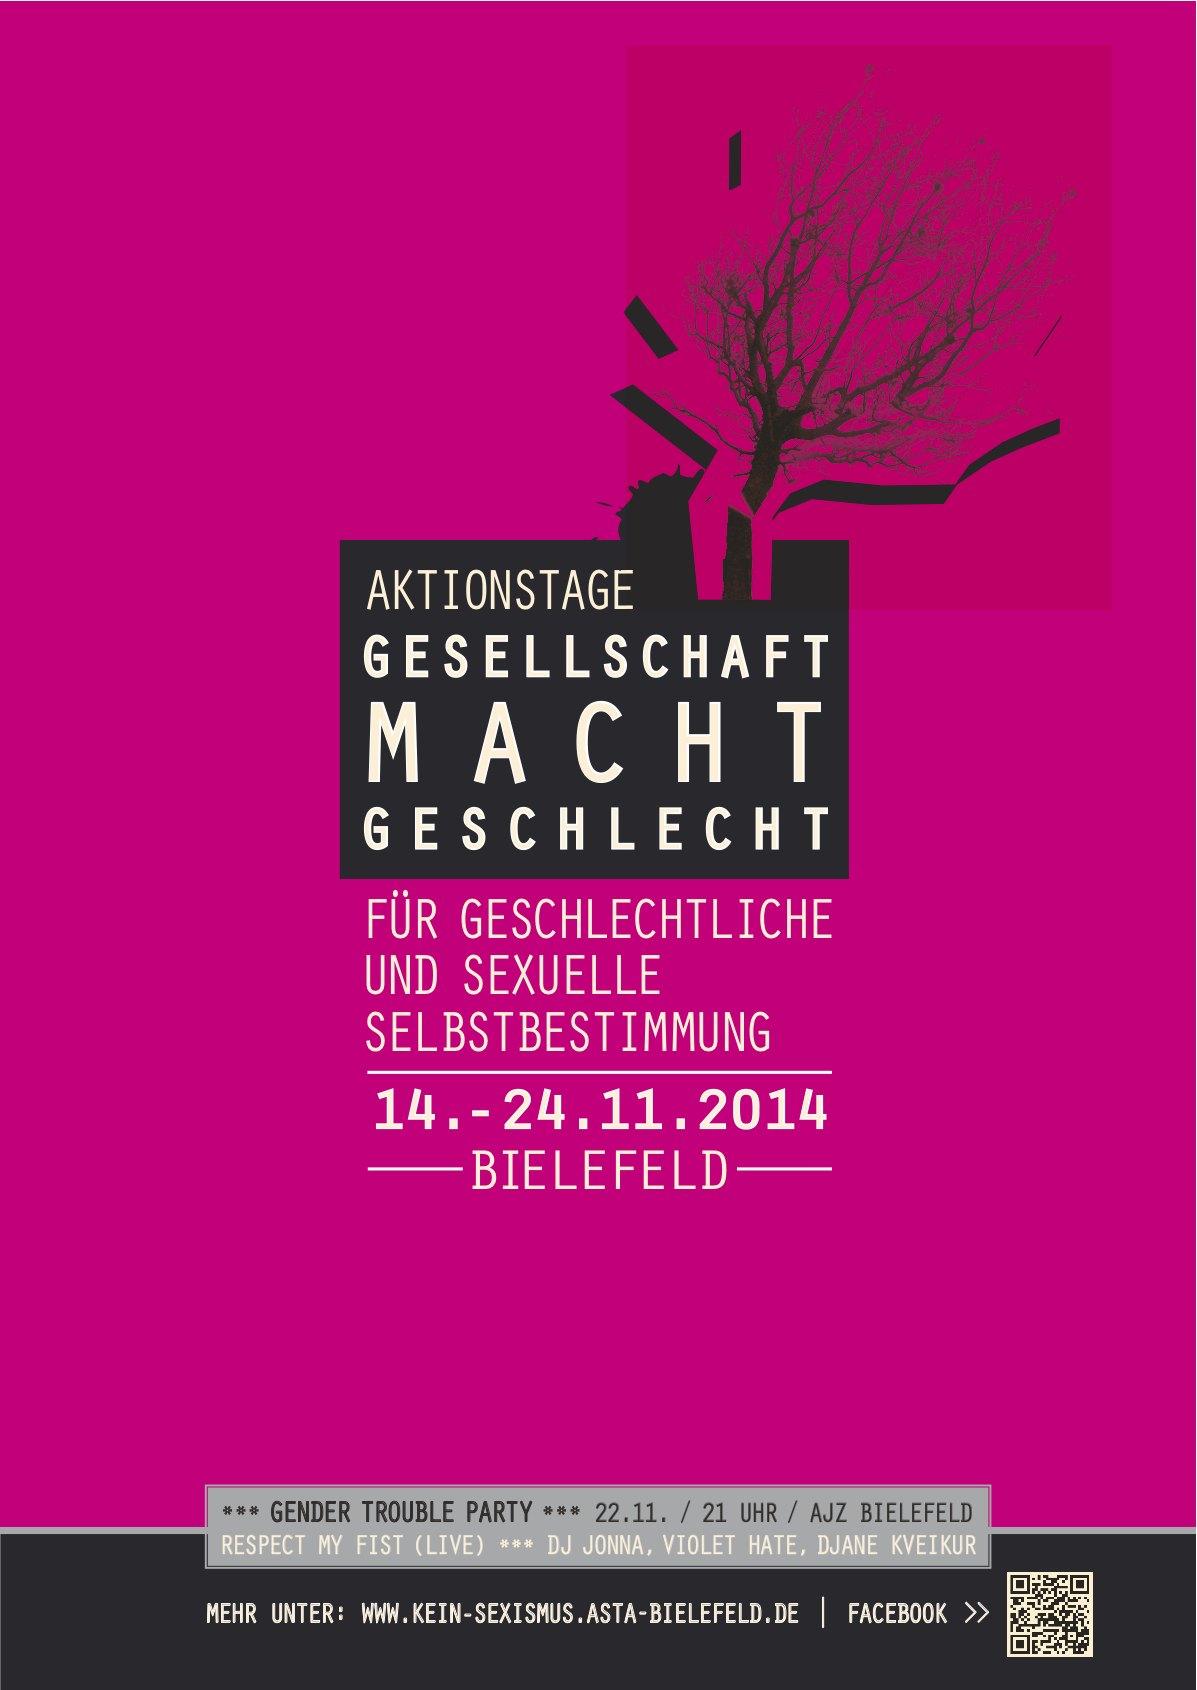 Aktionstage Bielefeld